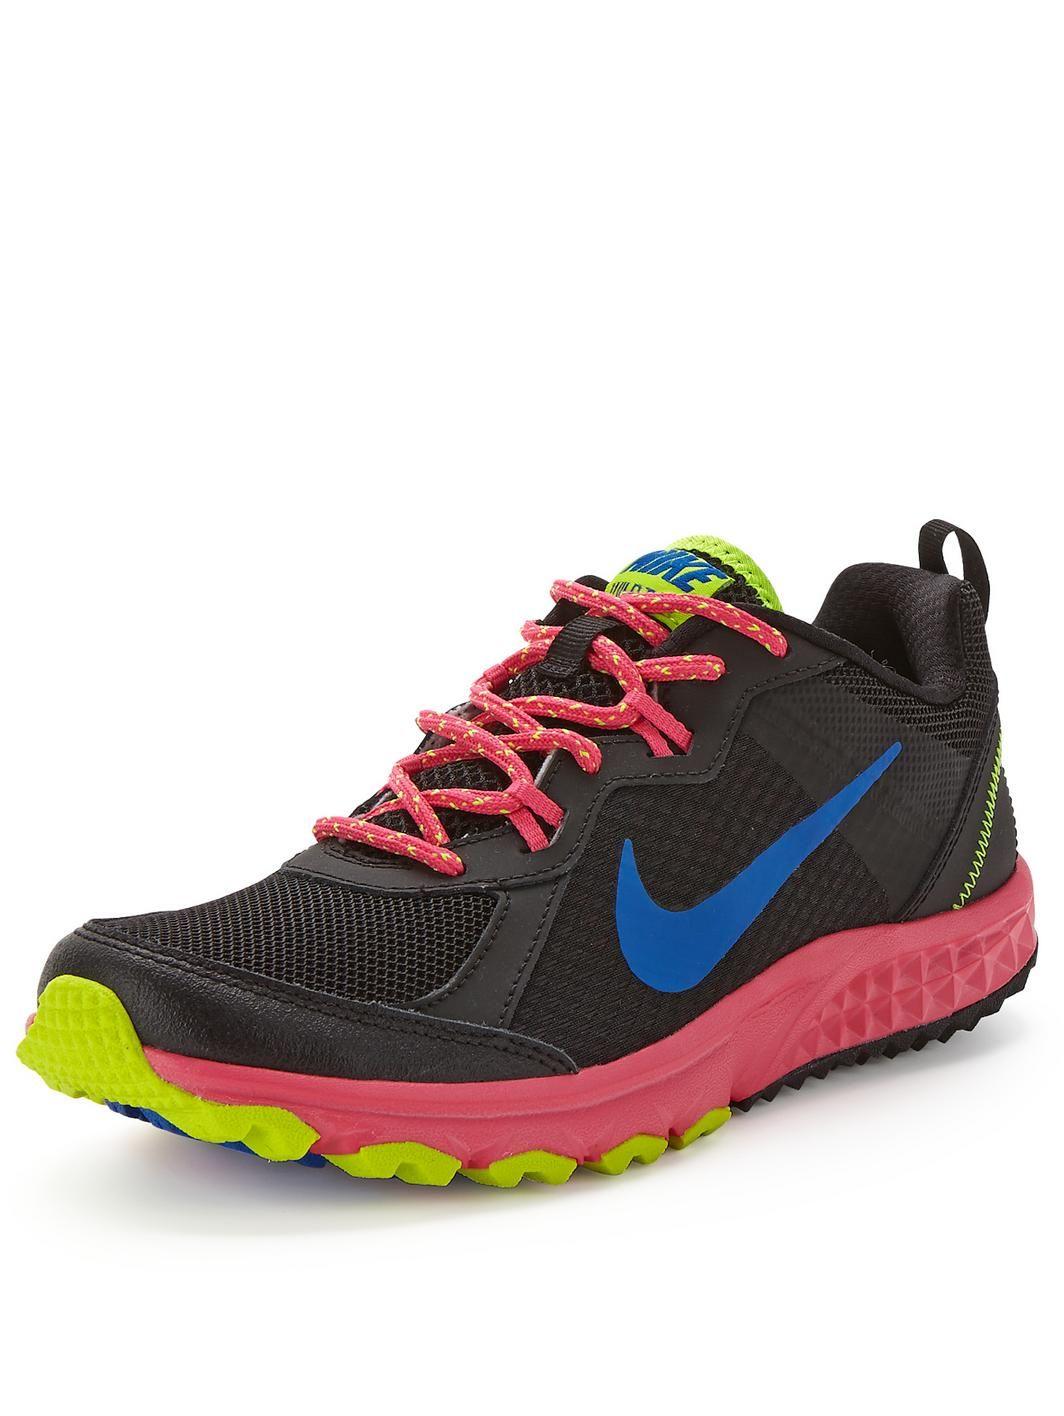 3c4bfc0a5cb01 Nike Wild Trail Women s Trail Running Shoes HO14 Womens Black